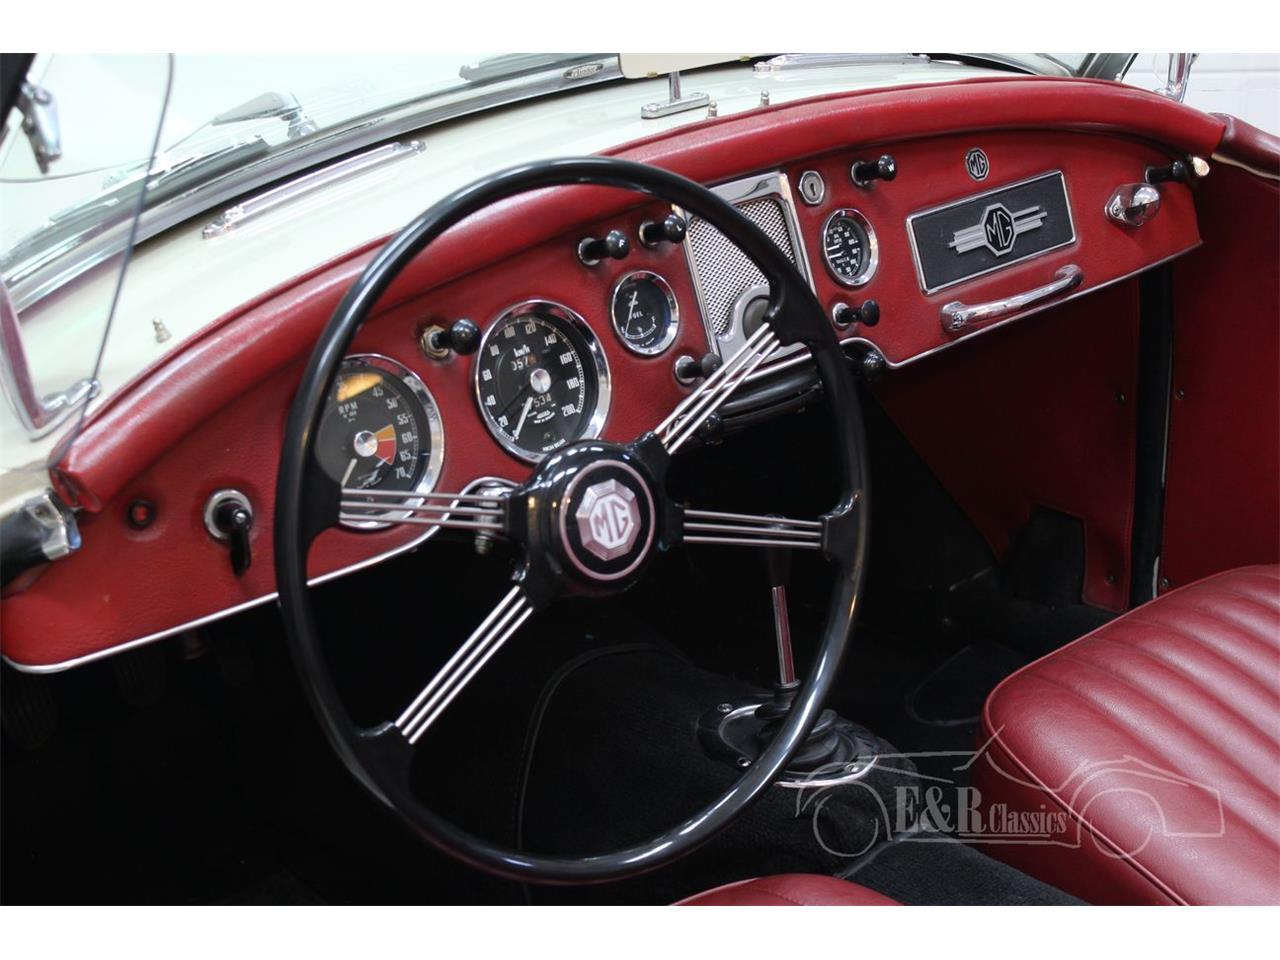 1959 MG MGA (CC-1356534) for sale in Waalwijk, Noord-Brabant